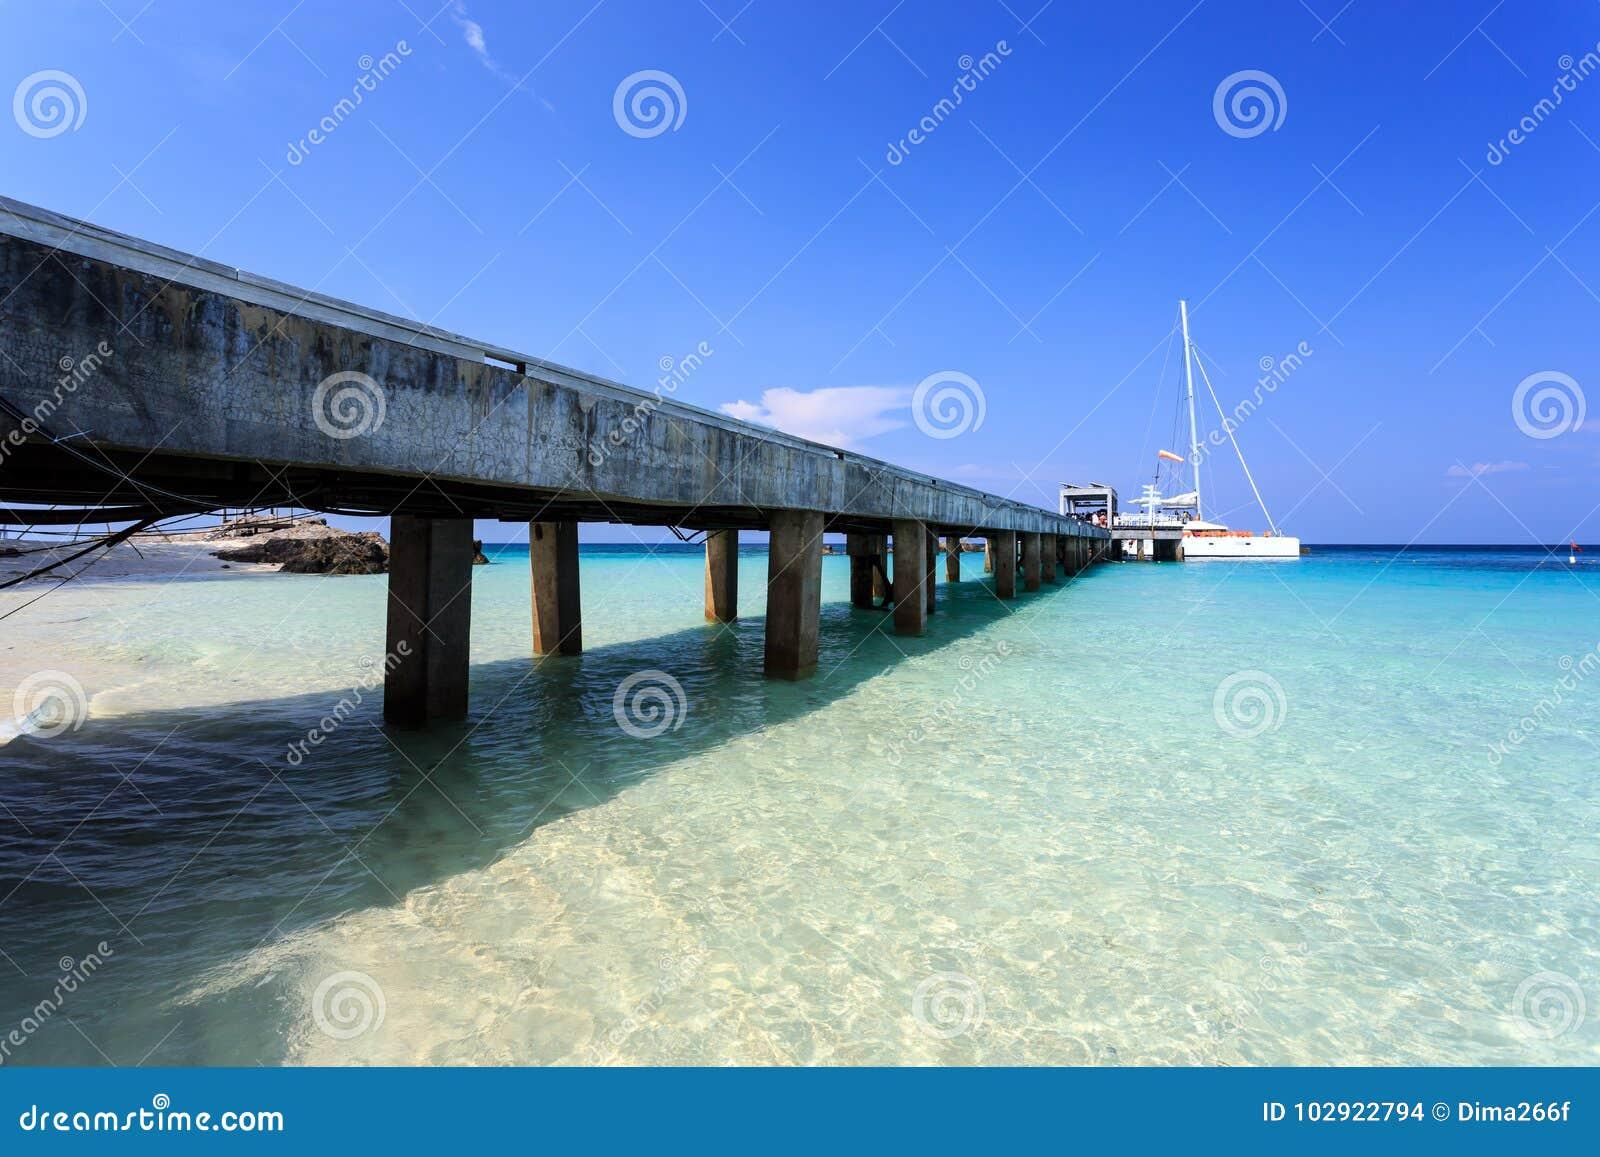 Dream Dream Pier, what dreams Pier in a dream to see 53